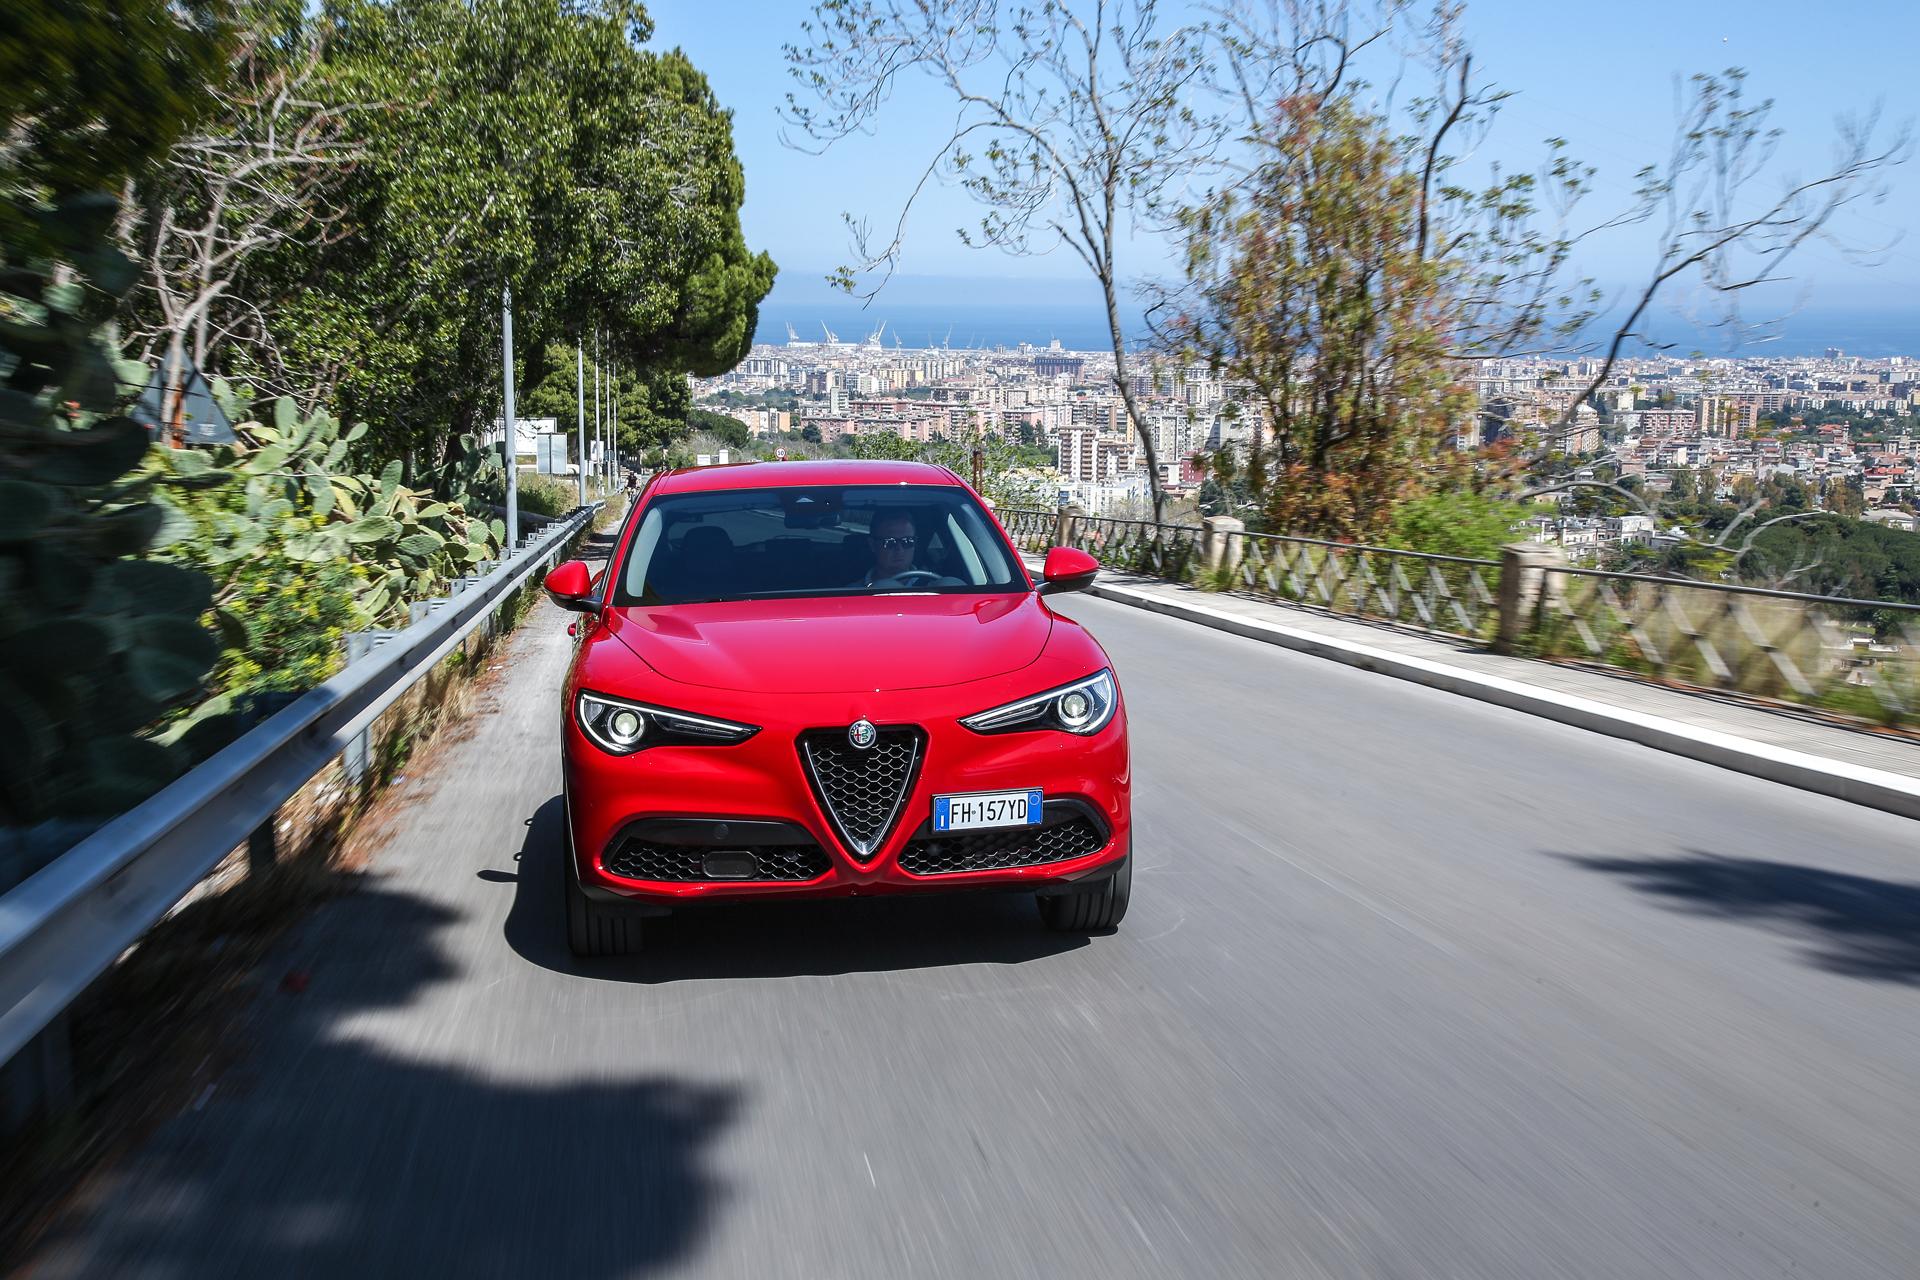 170420_Alfa-Romeo_Gastronomia_07.jpg